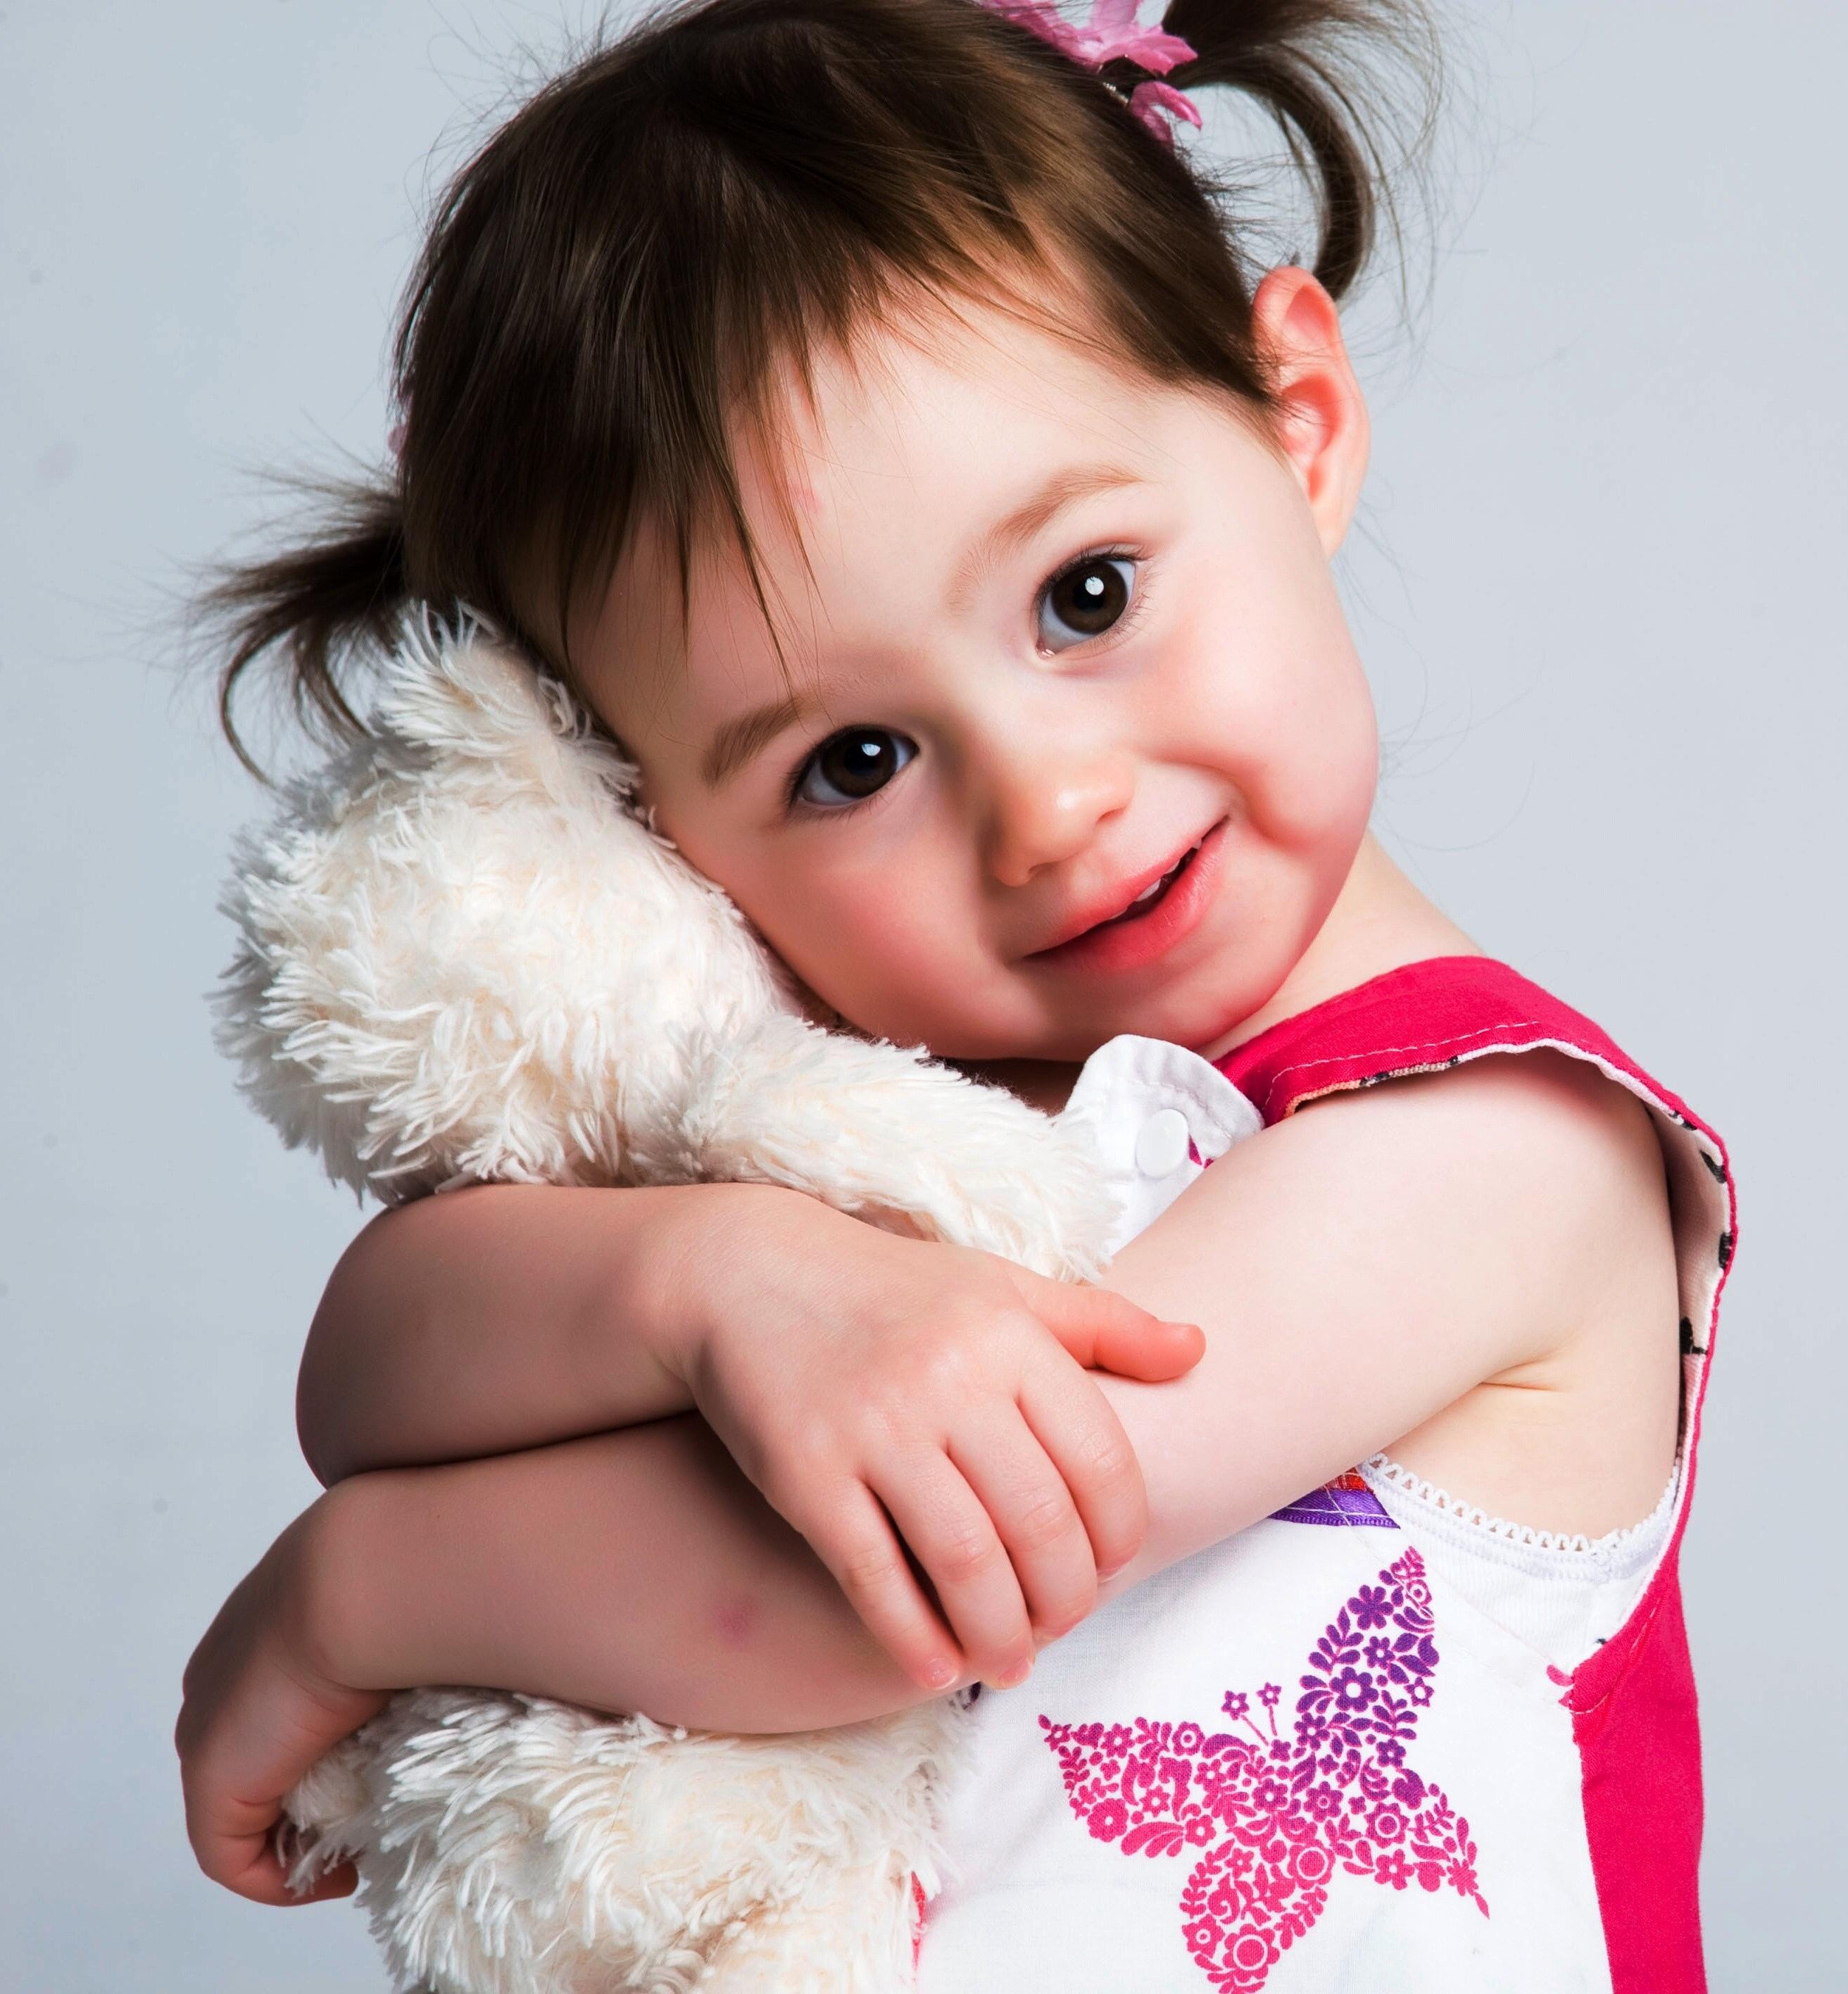 Little girl hugging stuffed animal